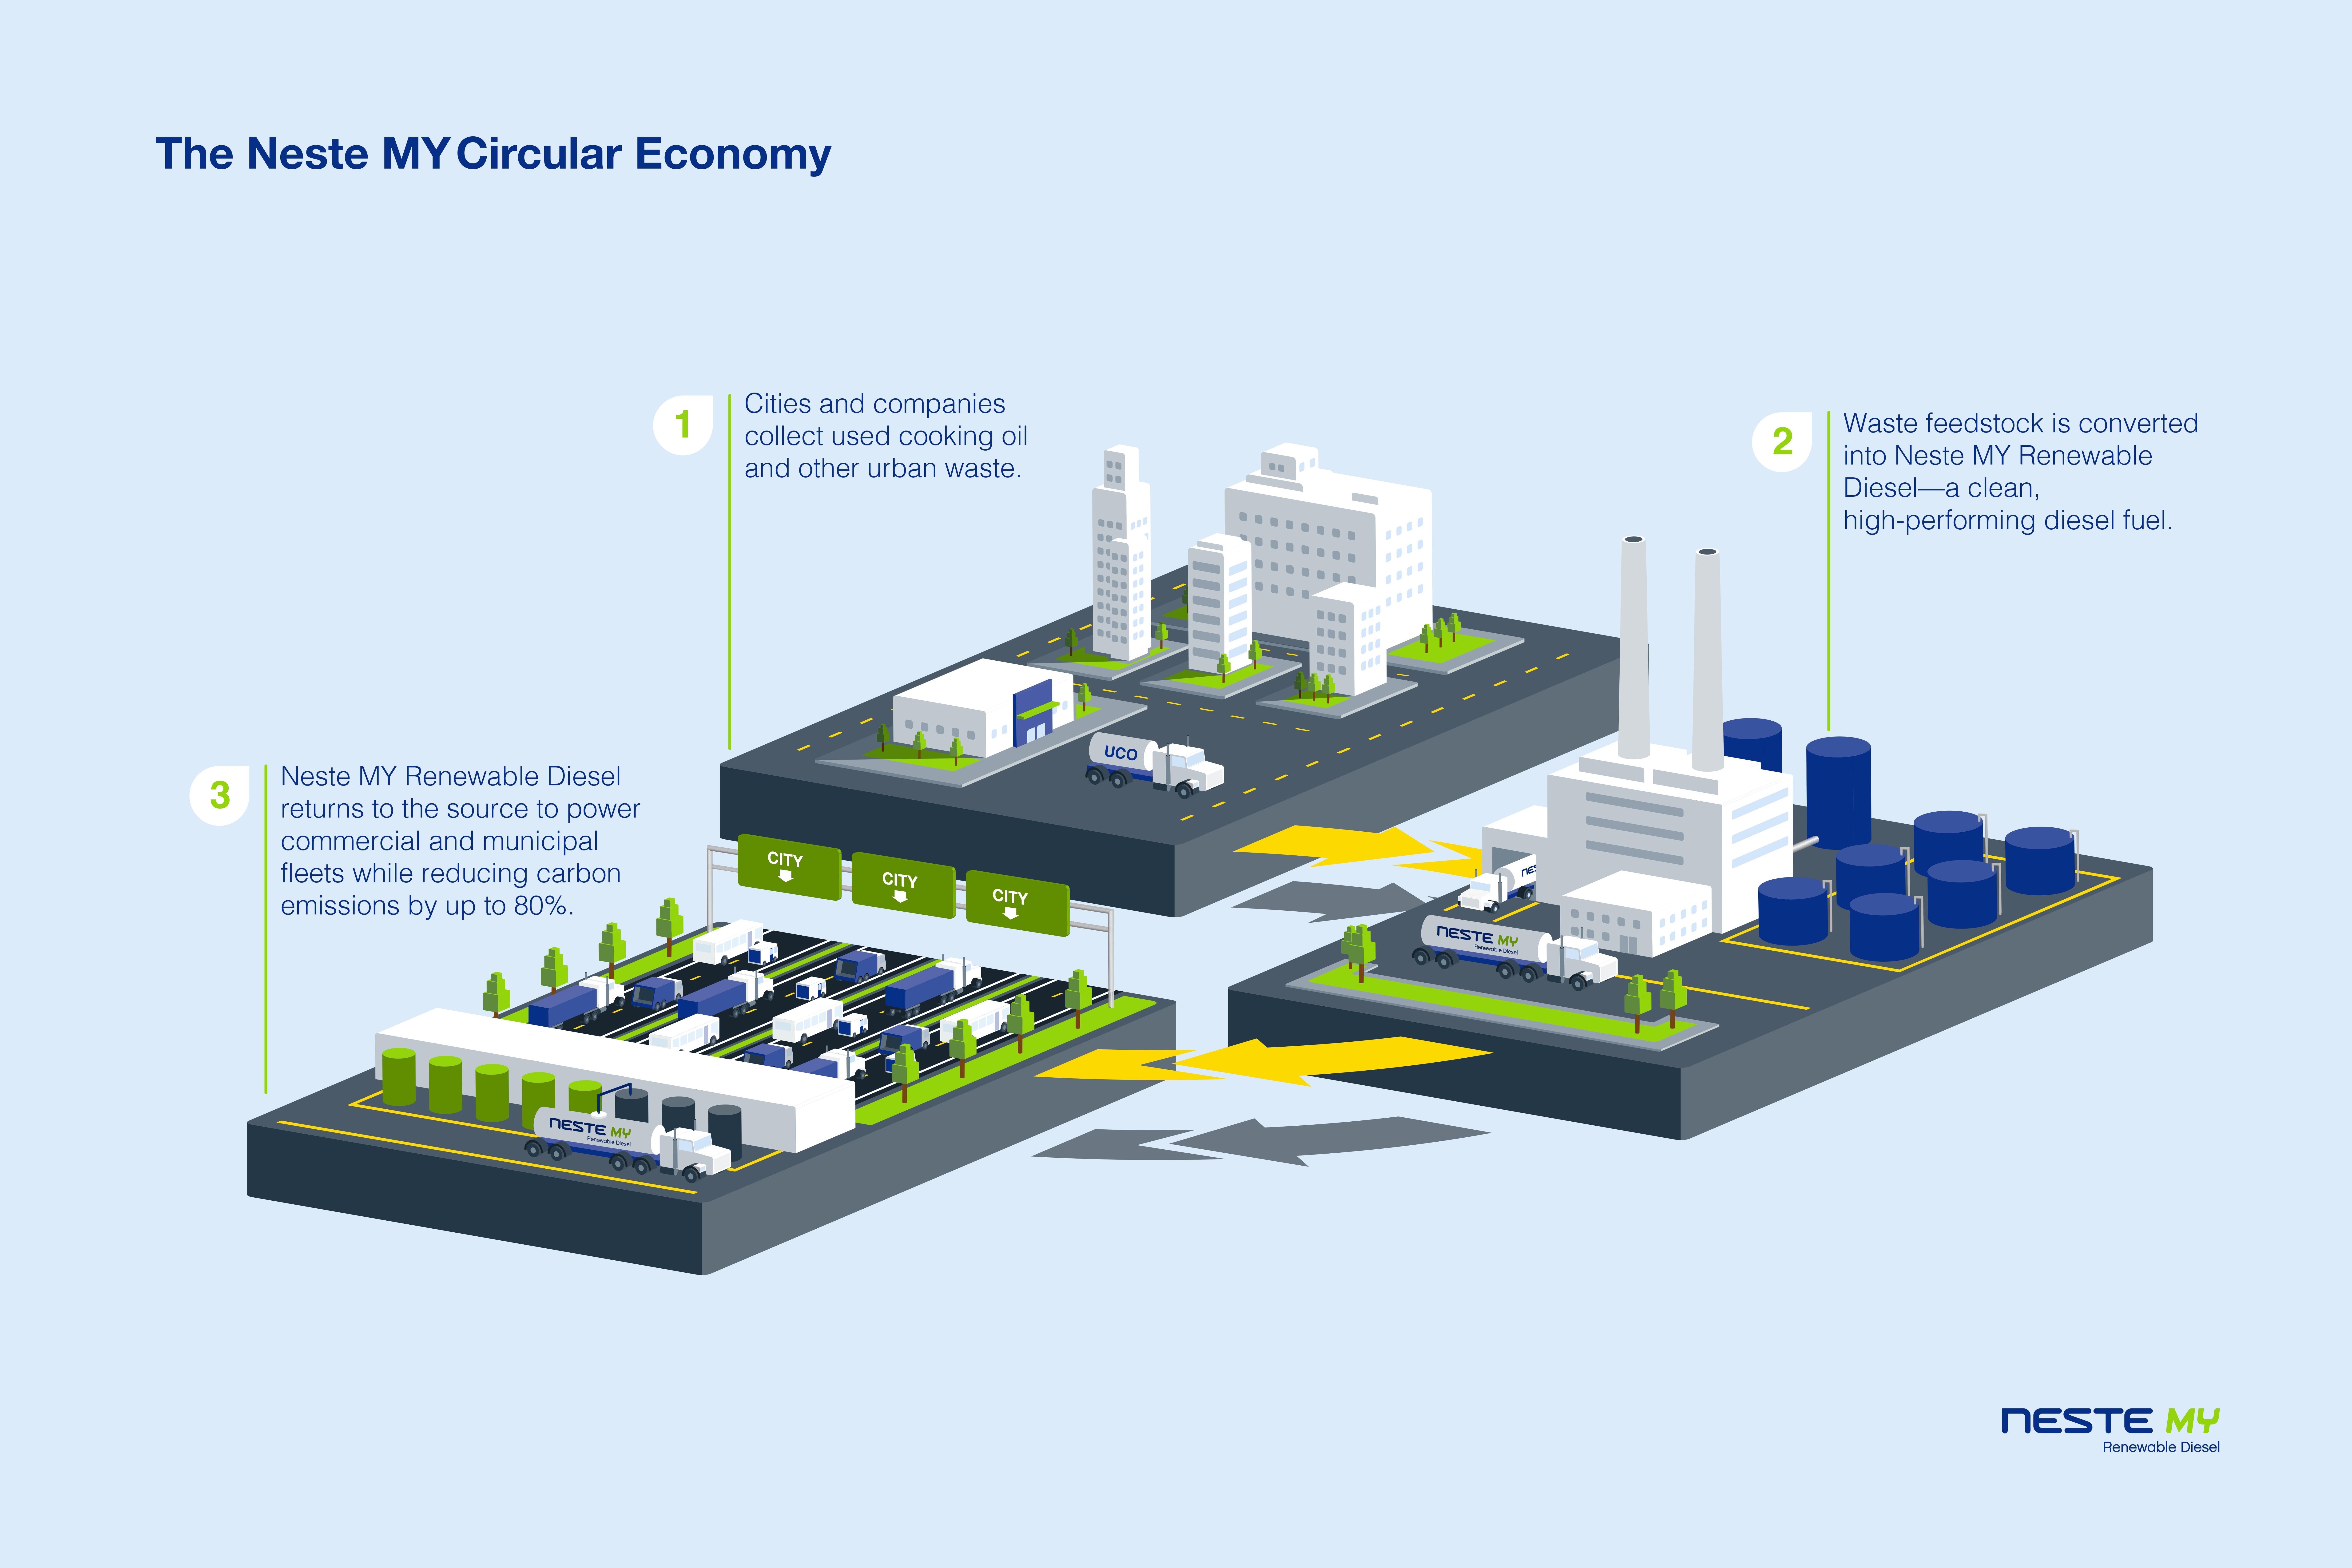 The circular economy infographic